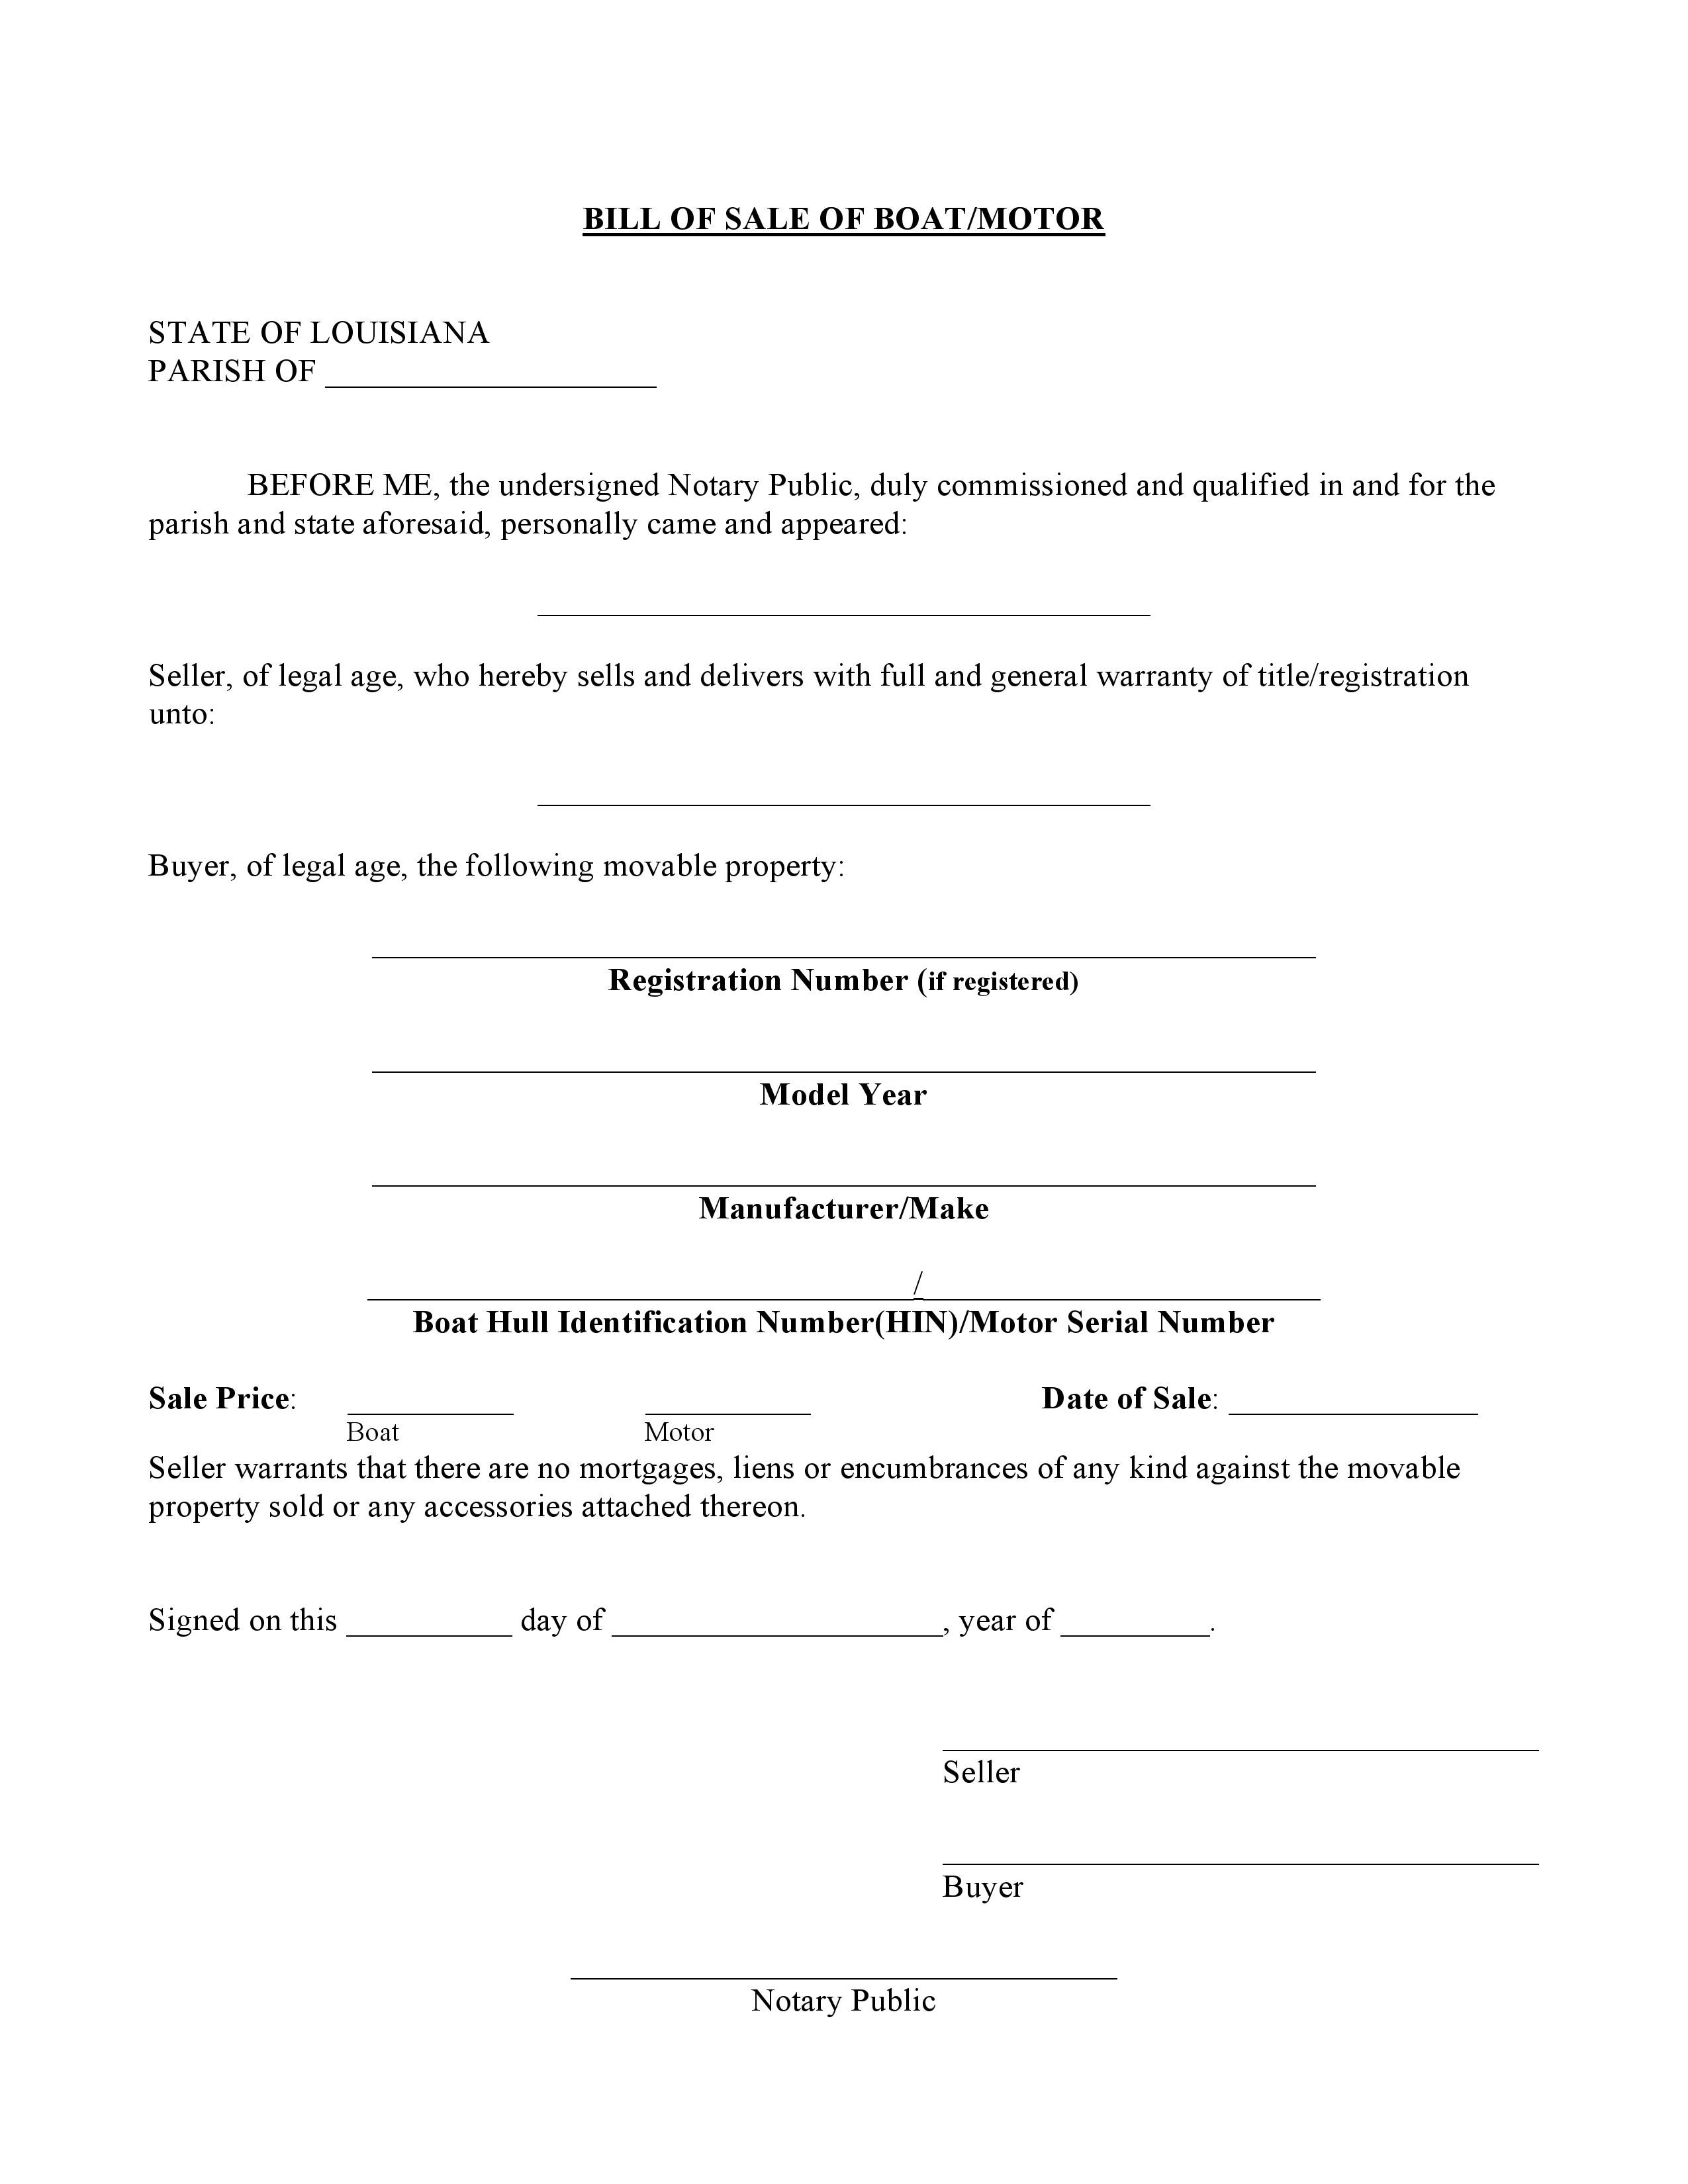 bill of sale louisiana Free Louisiana Boat Bill of Sale Form | PDF | Word | Do it Yourself ...